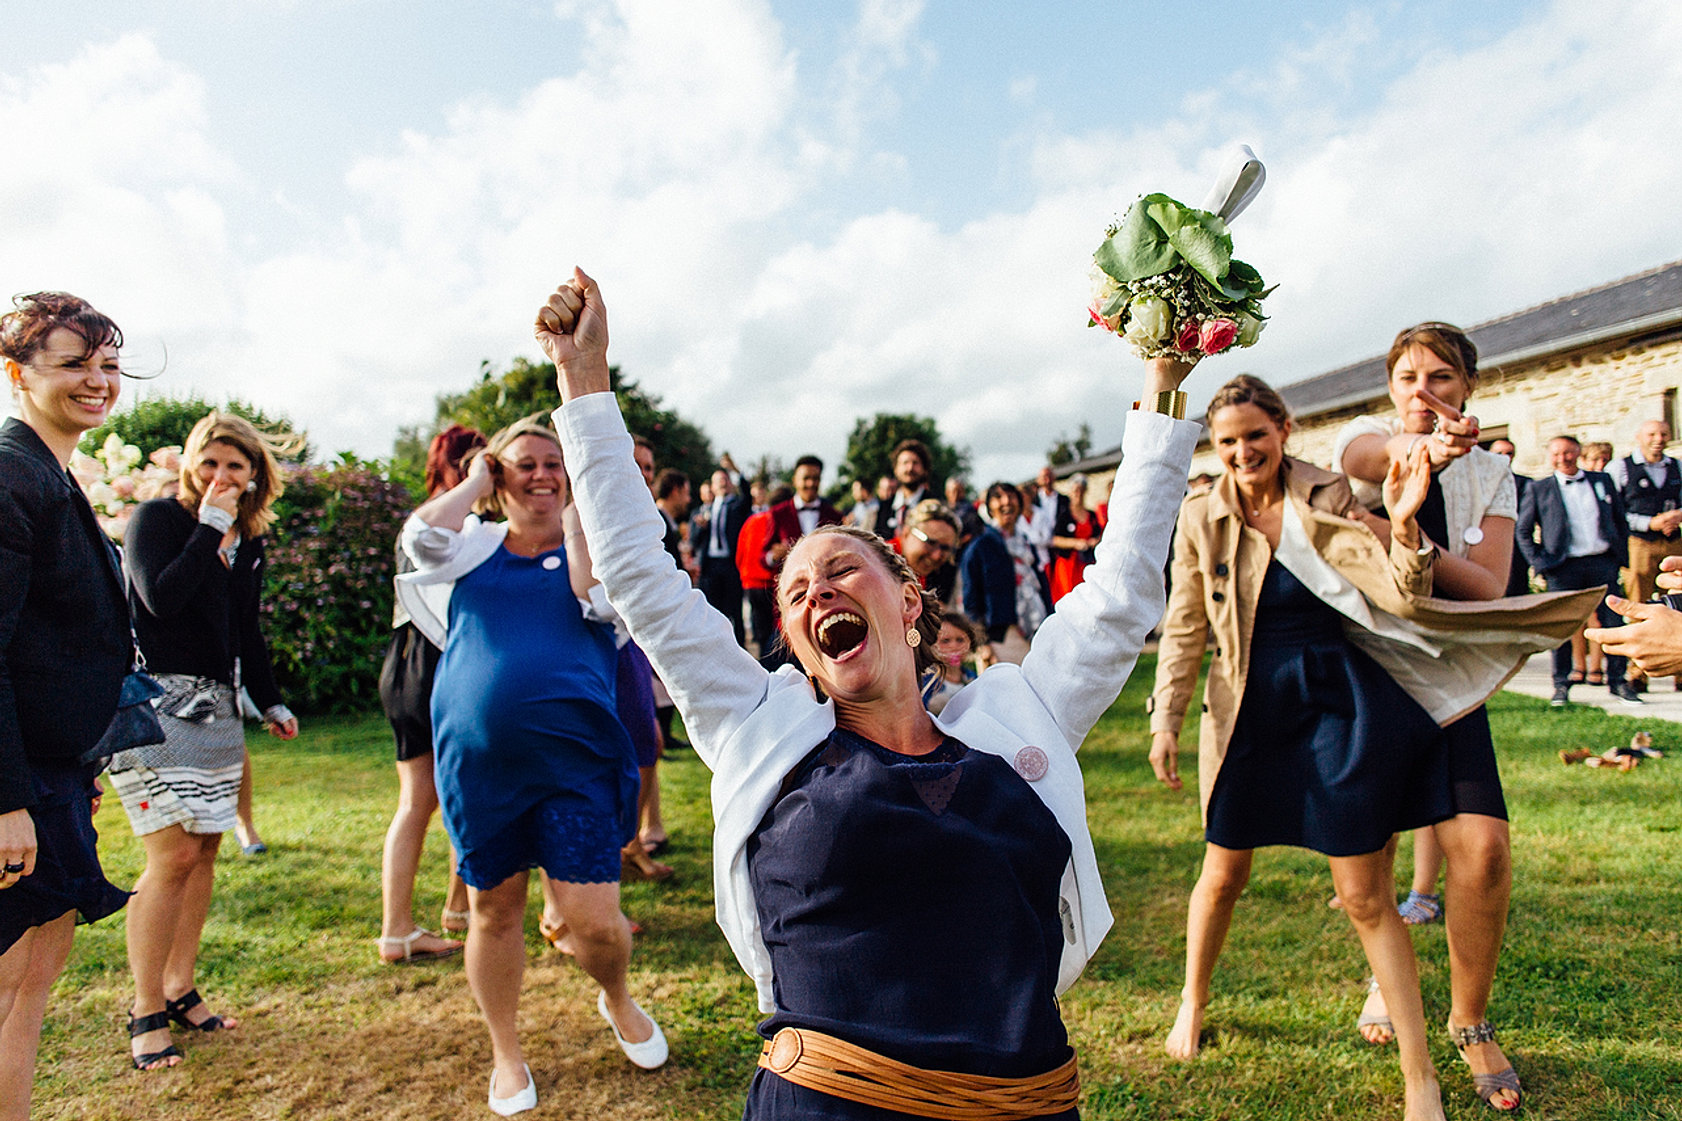 photographe mariage lorient - Photographe Mariage Lorient